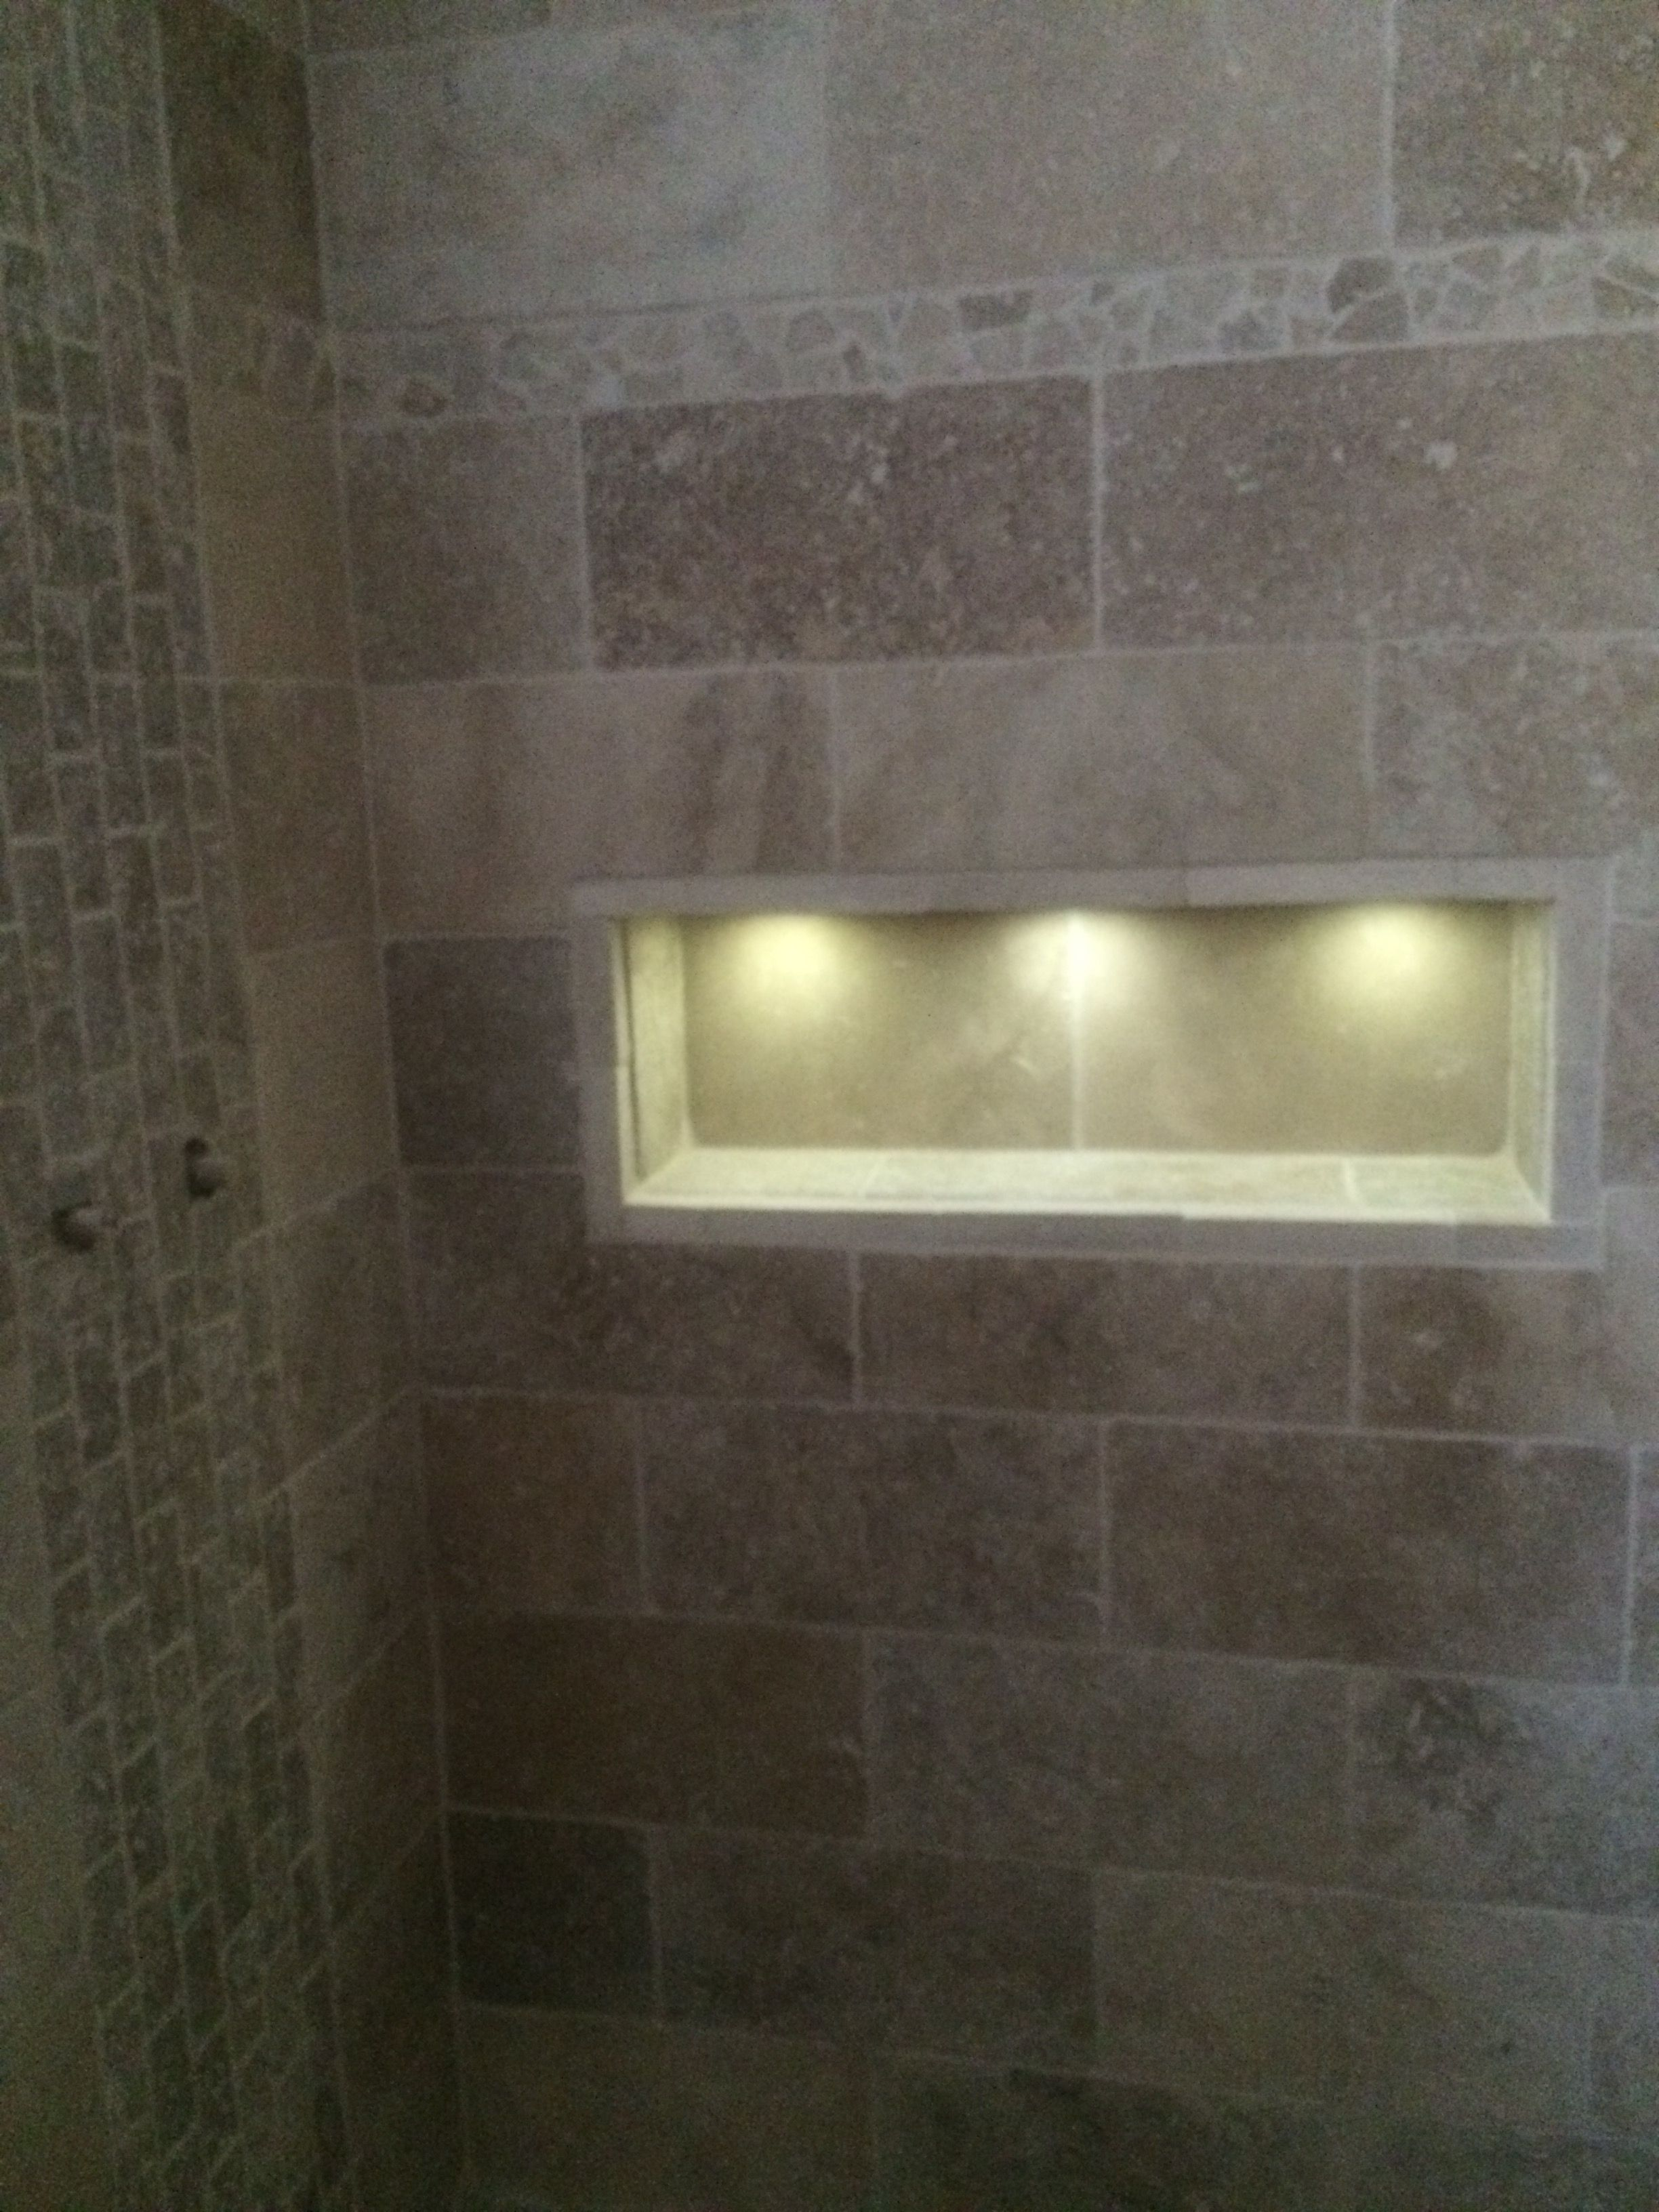 salle de bain travertin douche italienne niche spots maison salle de bain travertin salle. Black Bedroom Furniture Sets. Home Design Ideas